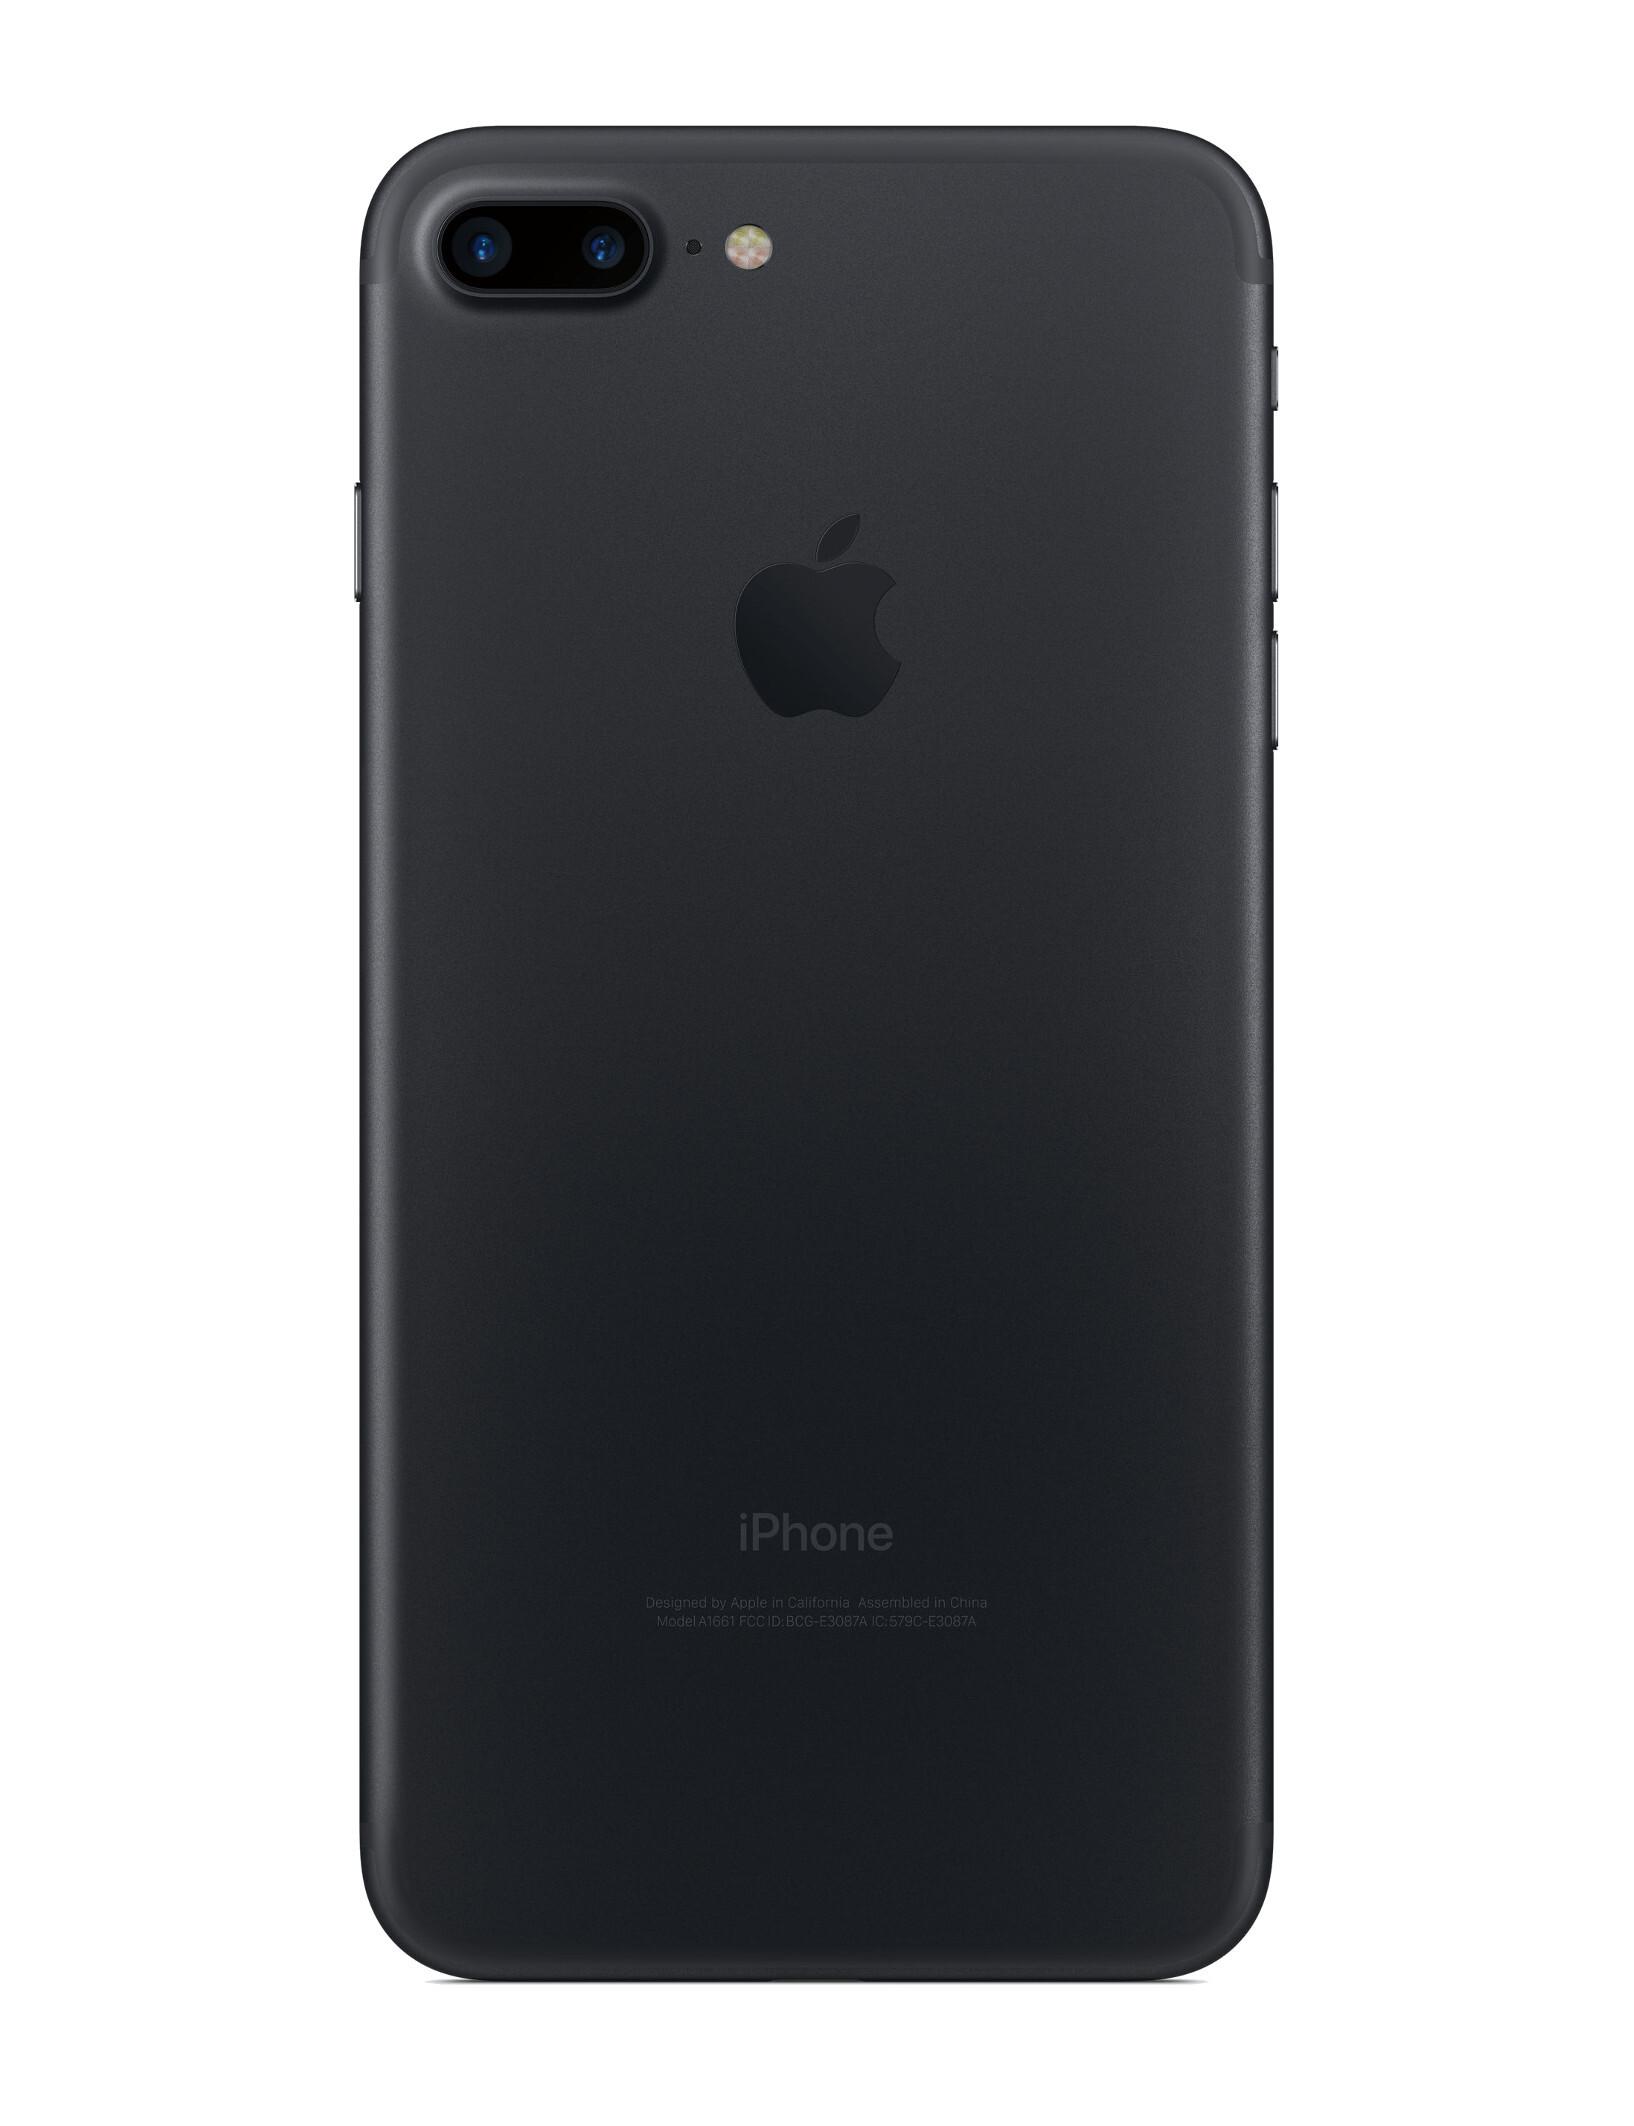 apple iphone 7 plus size comparison versus iphone 6s plus galaxy note 7 lg v20 nexus 6p s7. Black Bedroom Furniture Sets. Home Design Ideas